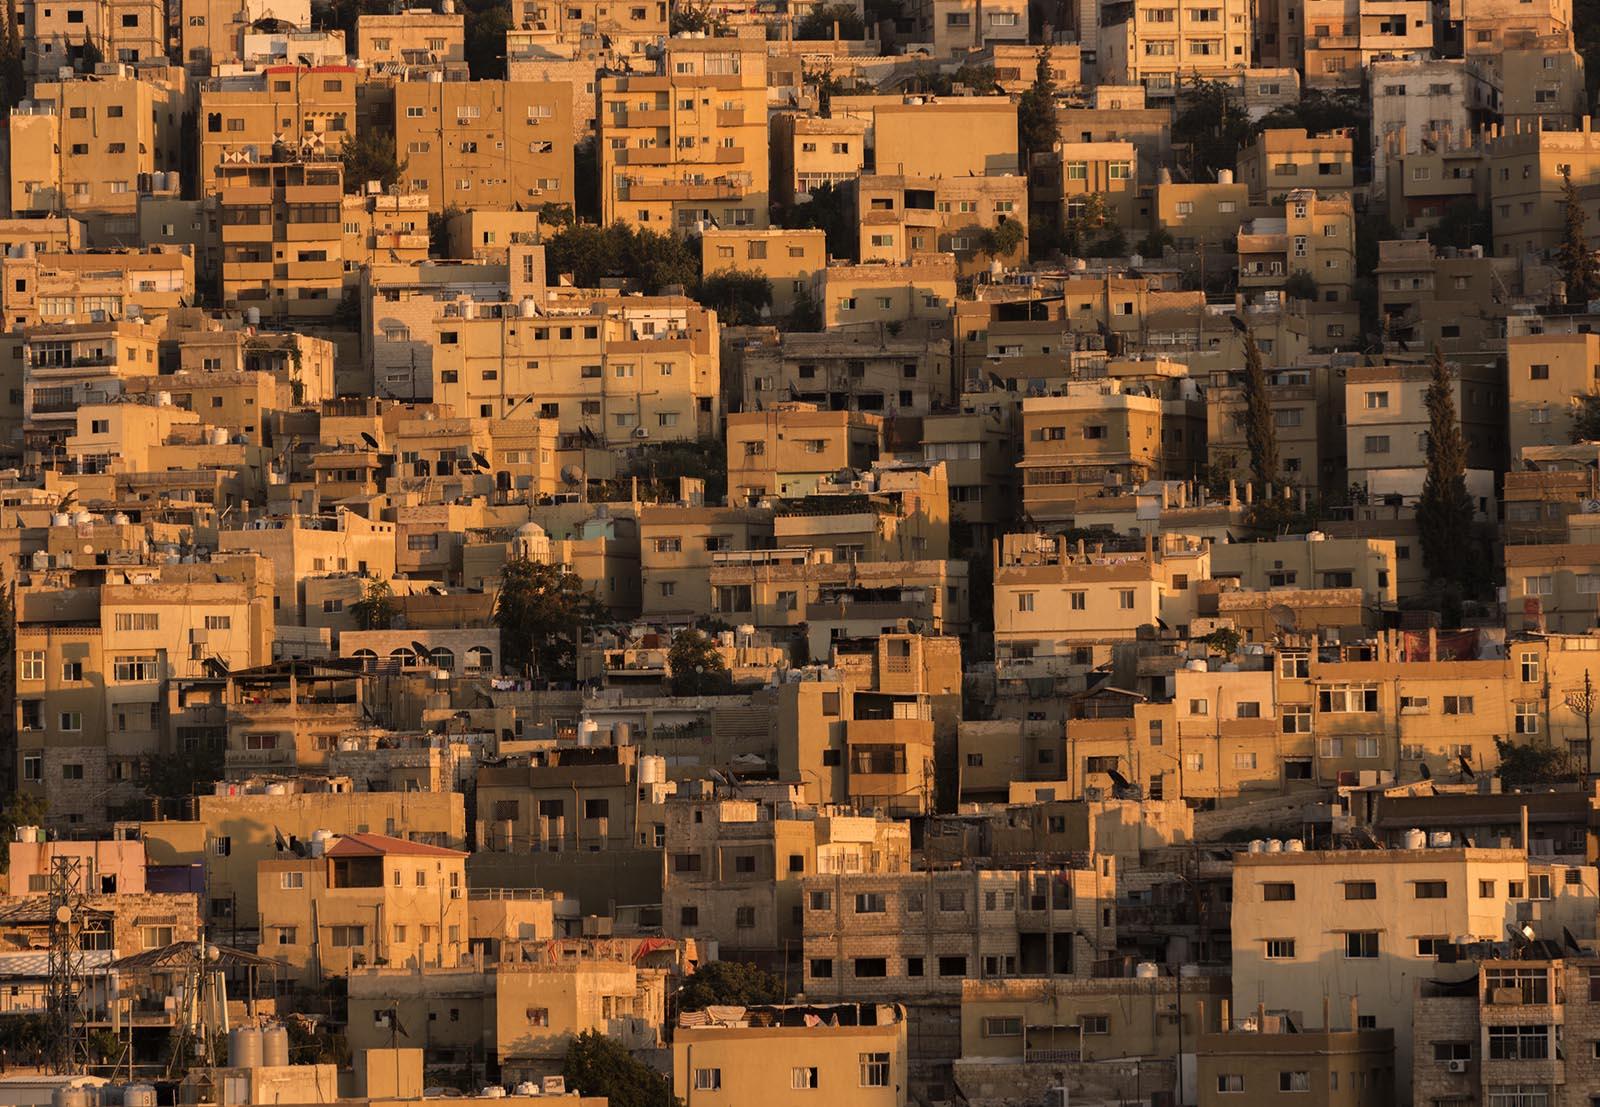 Amman Architecture